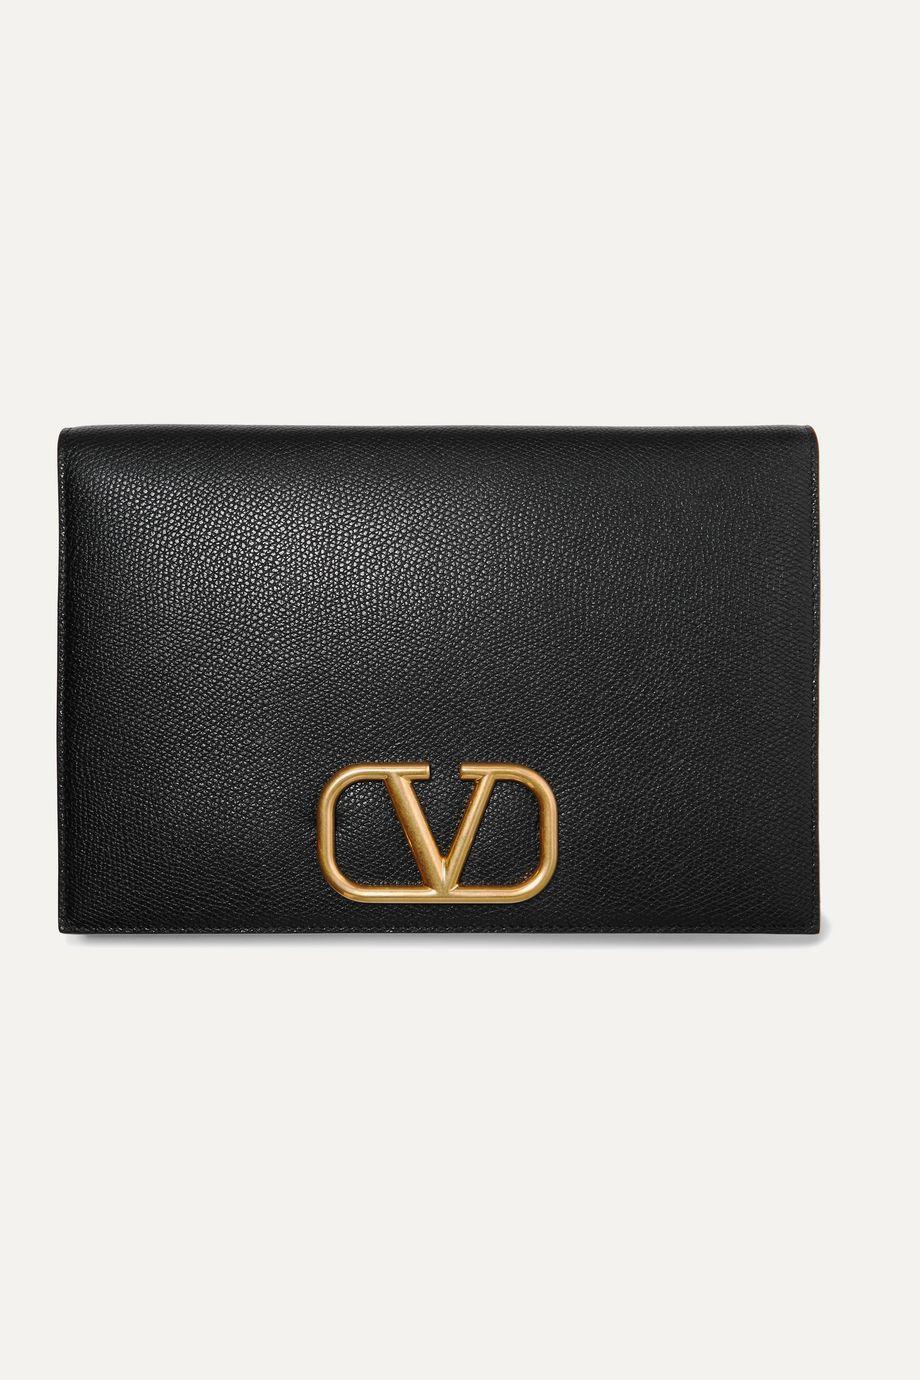 Valentino Valentino Garavani Go Logo textured-leather pouch